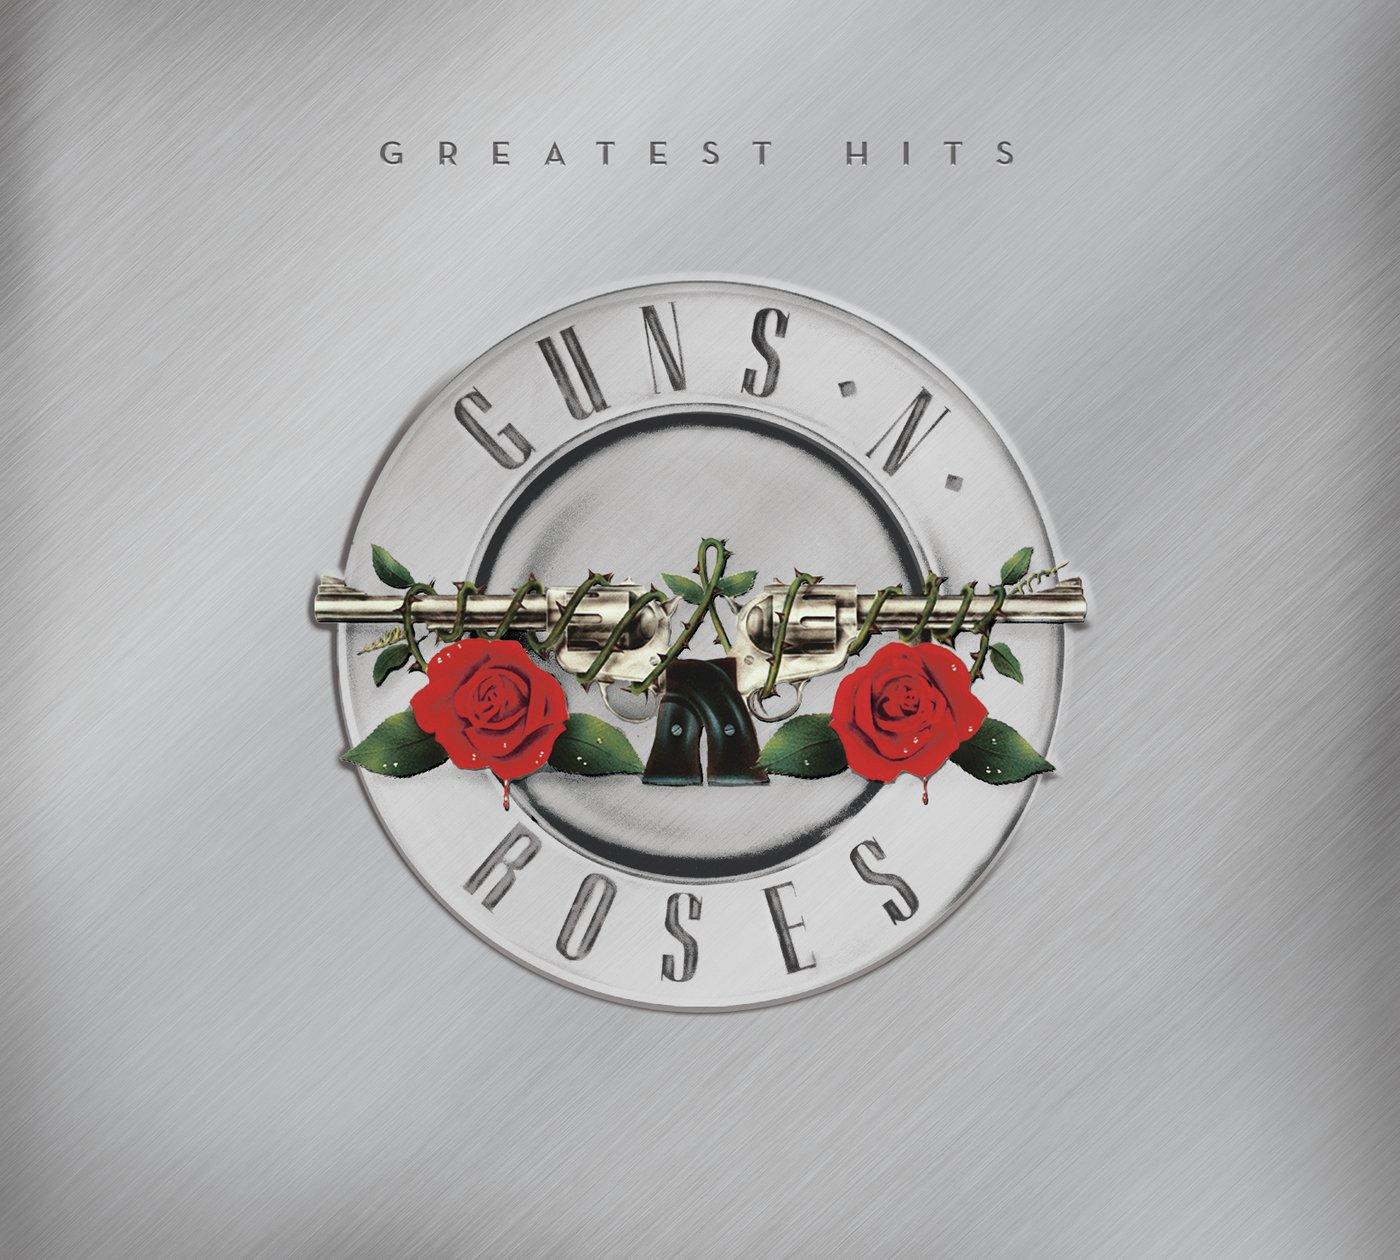 guns n' roses greatest